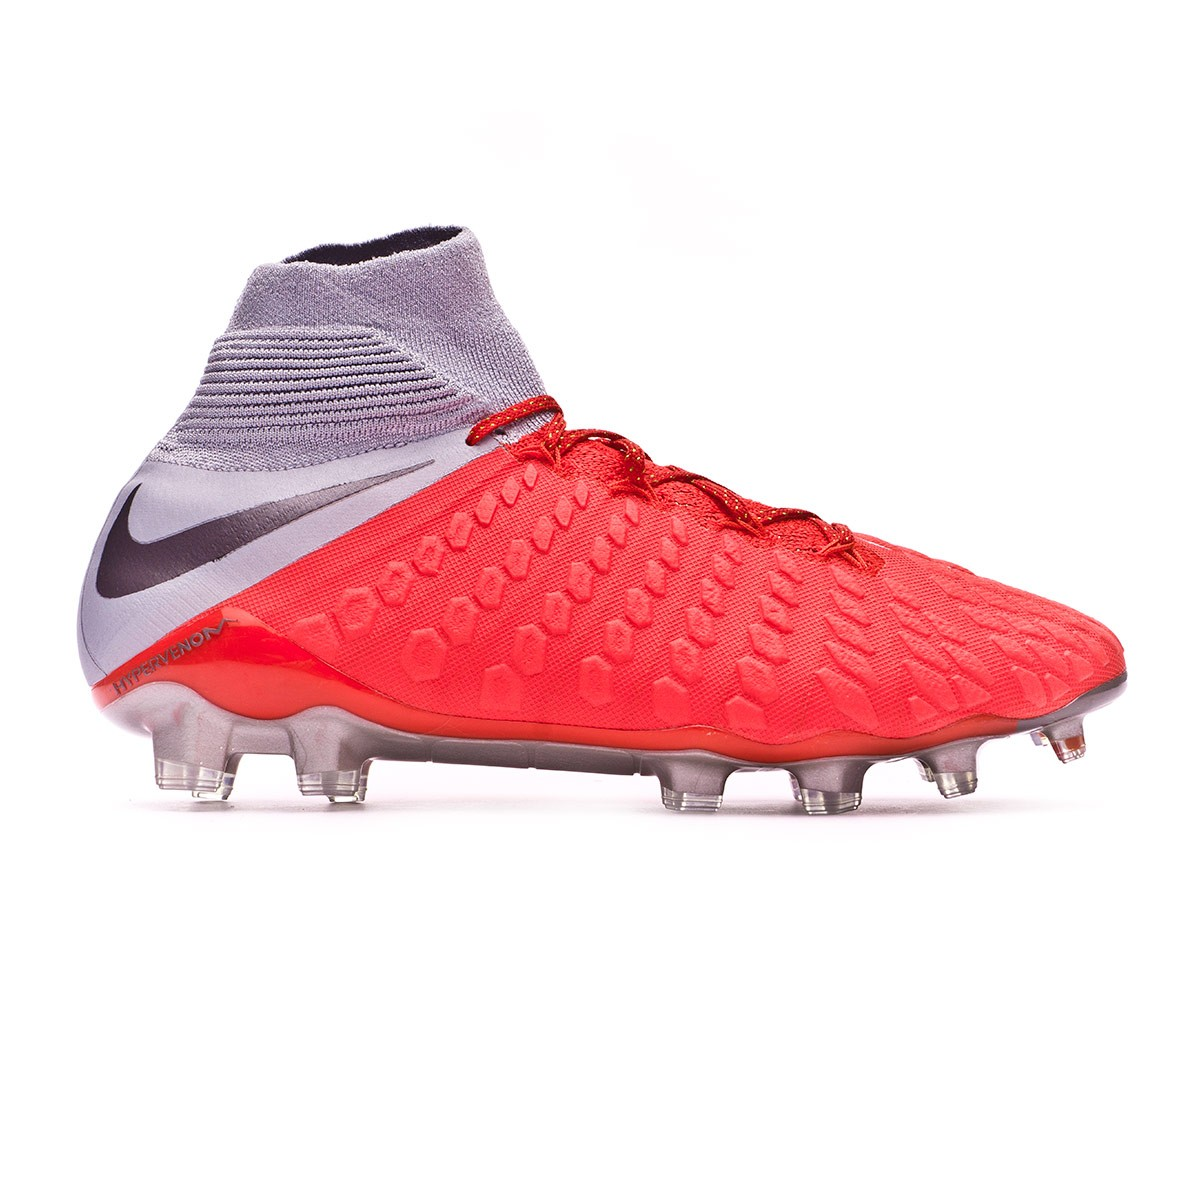 f0195ca28 Football Boots Nike Hypervenom Phantom III Elite DF FG Light  crimson-Metallic dark grey-Wolf grey - Tienda de fútbol Fútbol Emotion